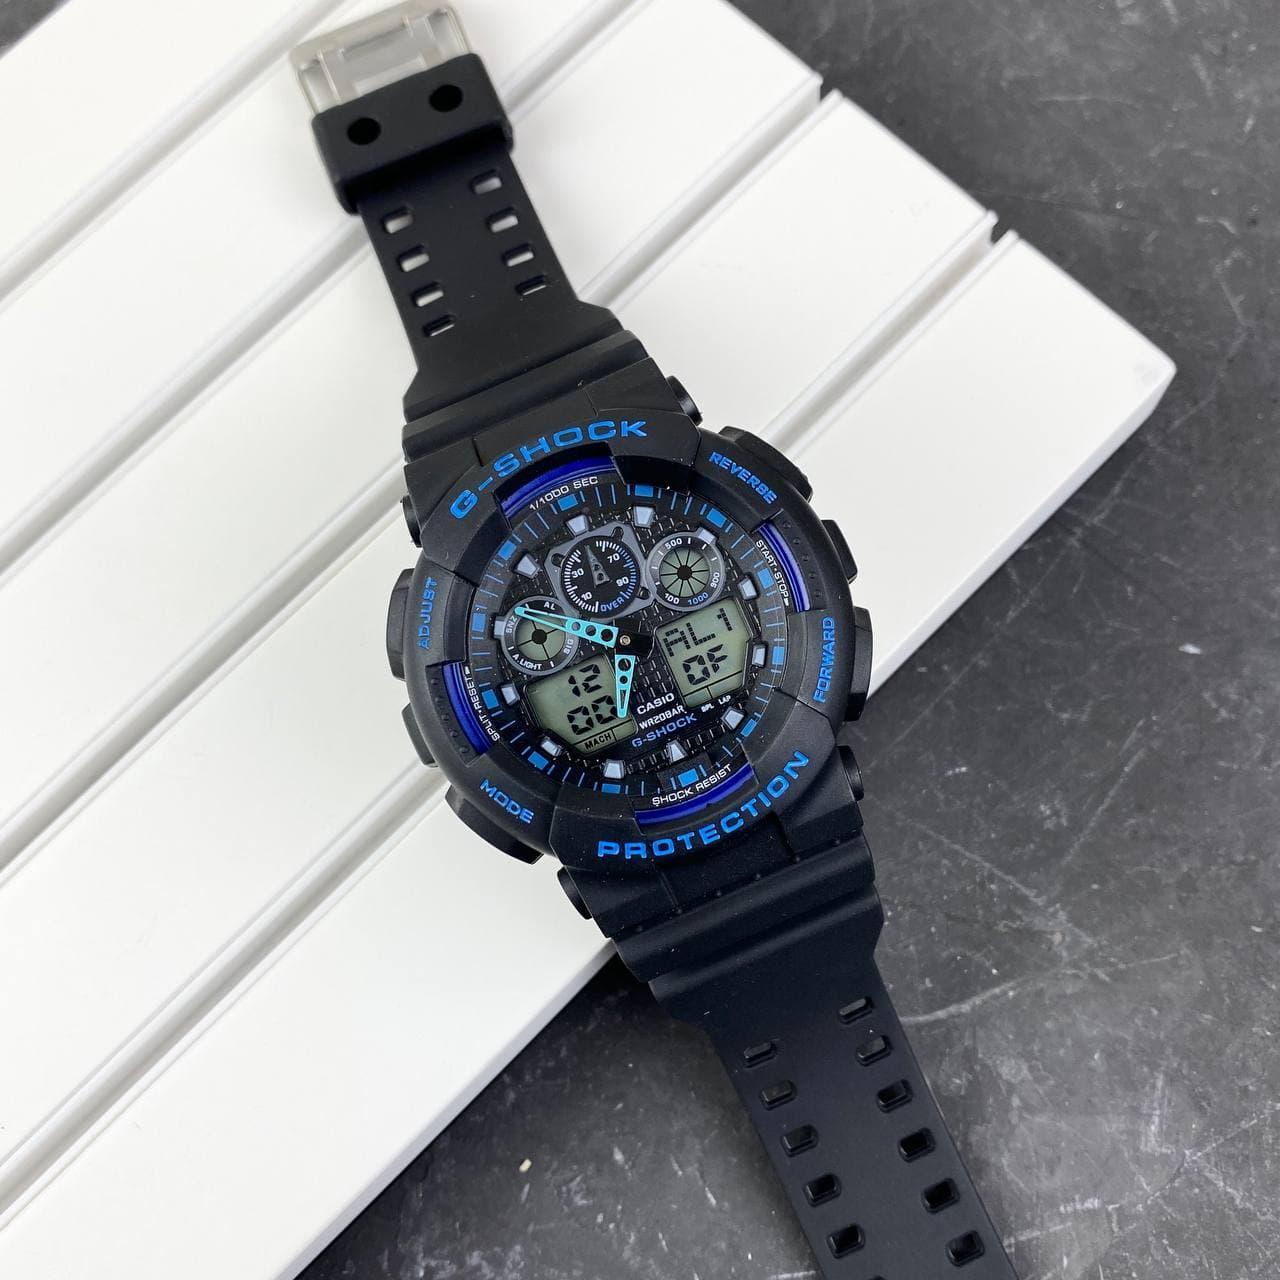 Мужские наручные часы Casio G-Shock GA-100 Black-Black-Blue